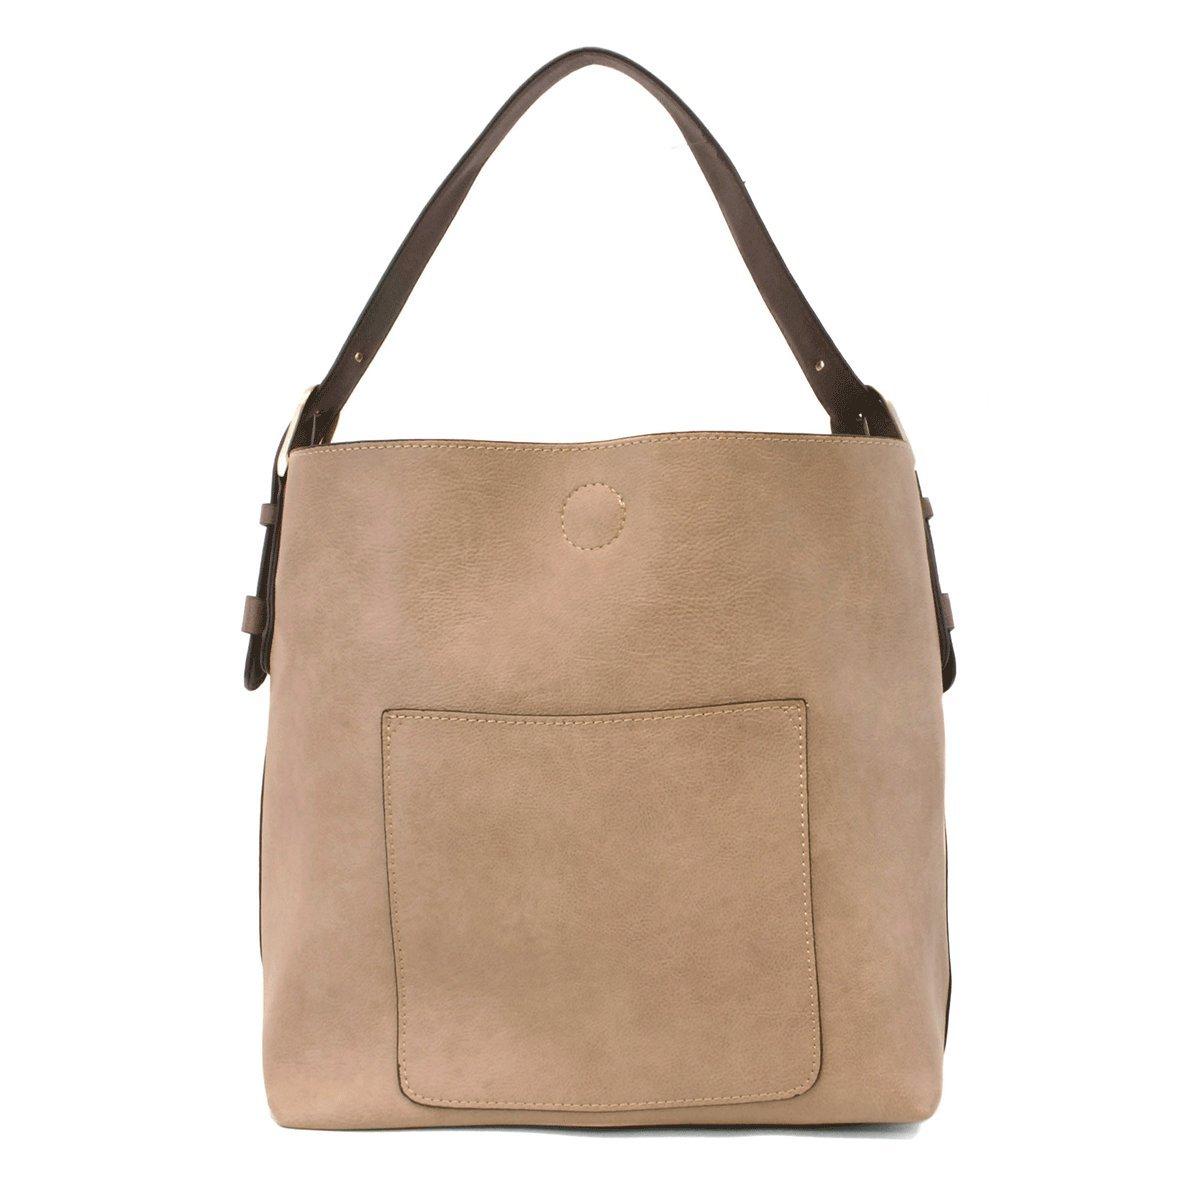 Heathered Grey Joy Susan Classic Hobo Handbag